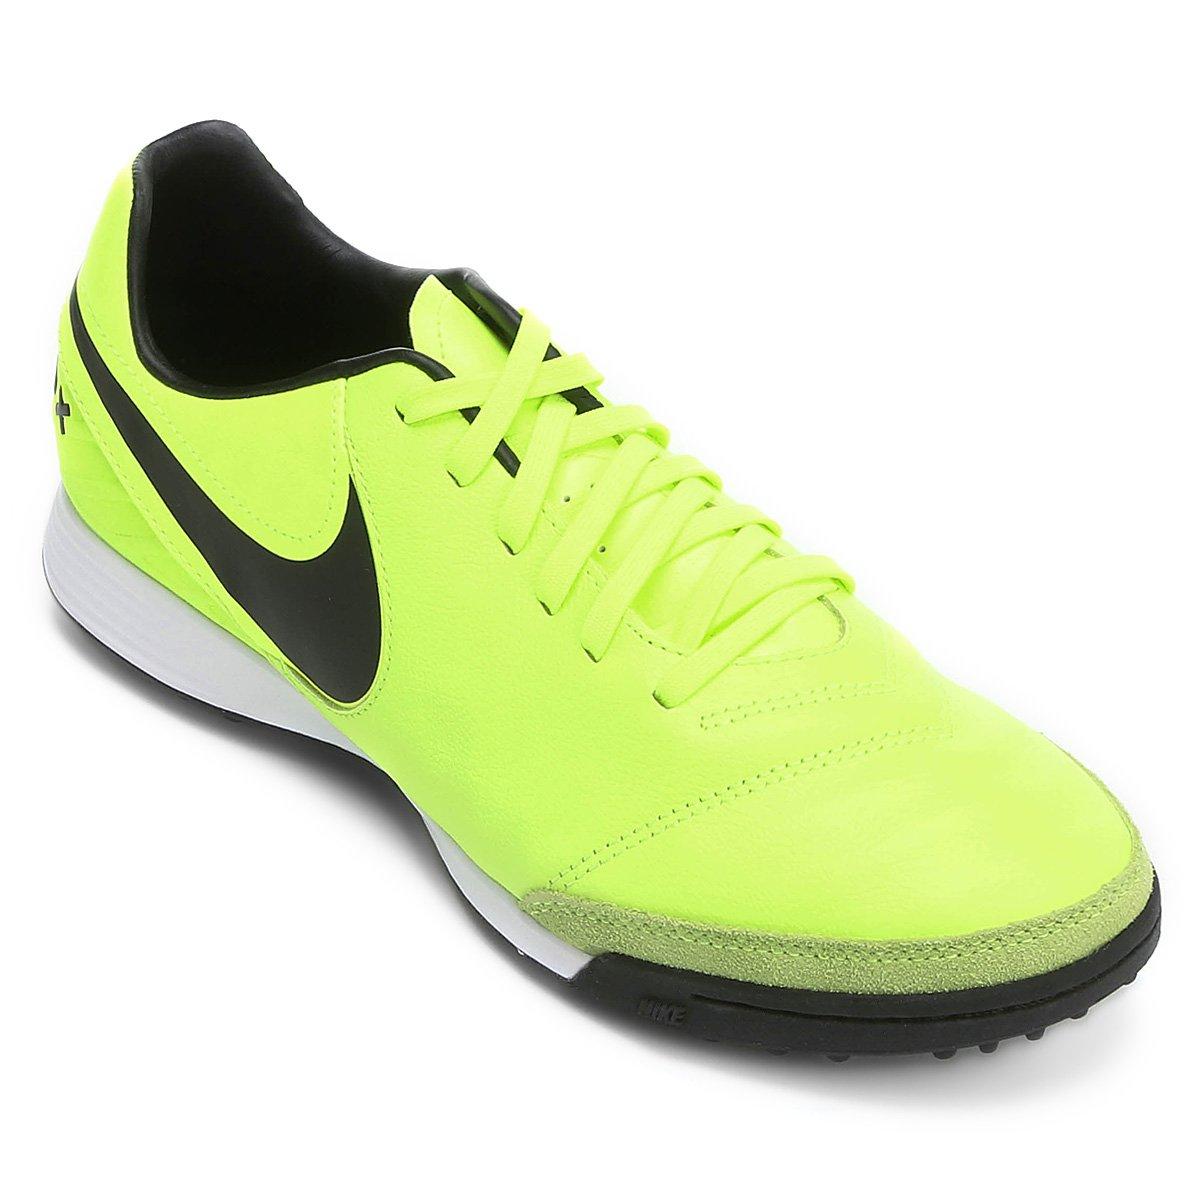 b05e5ac99d Chuteira Society Nike Tiempo Mystic 5 TF - Verde claro - Compre ...